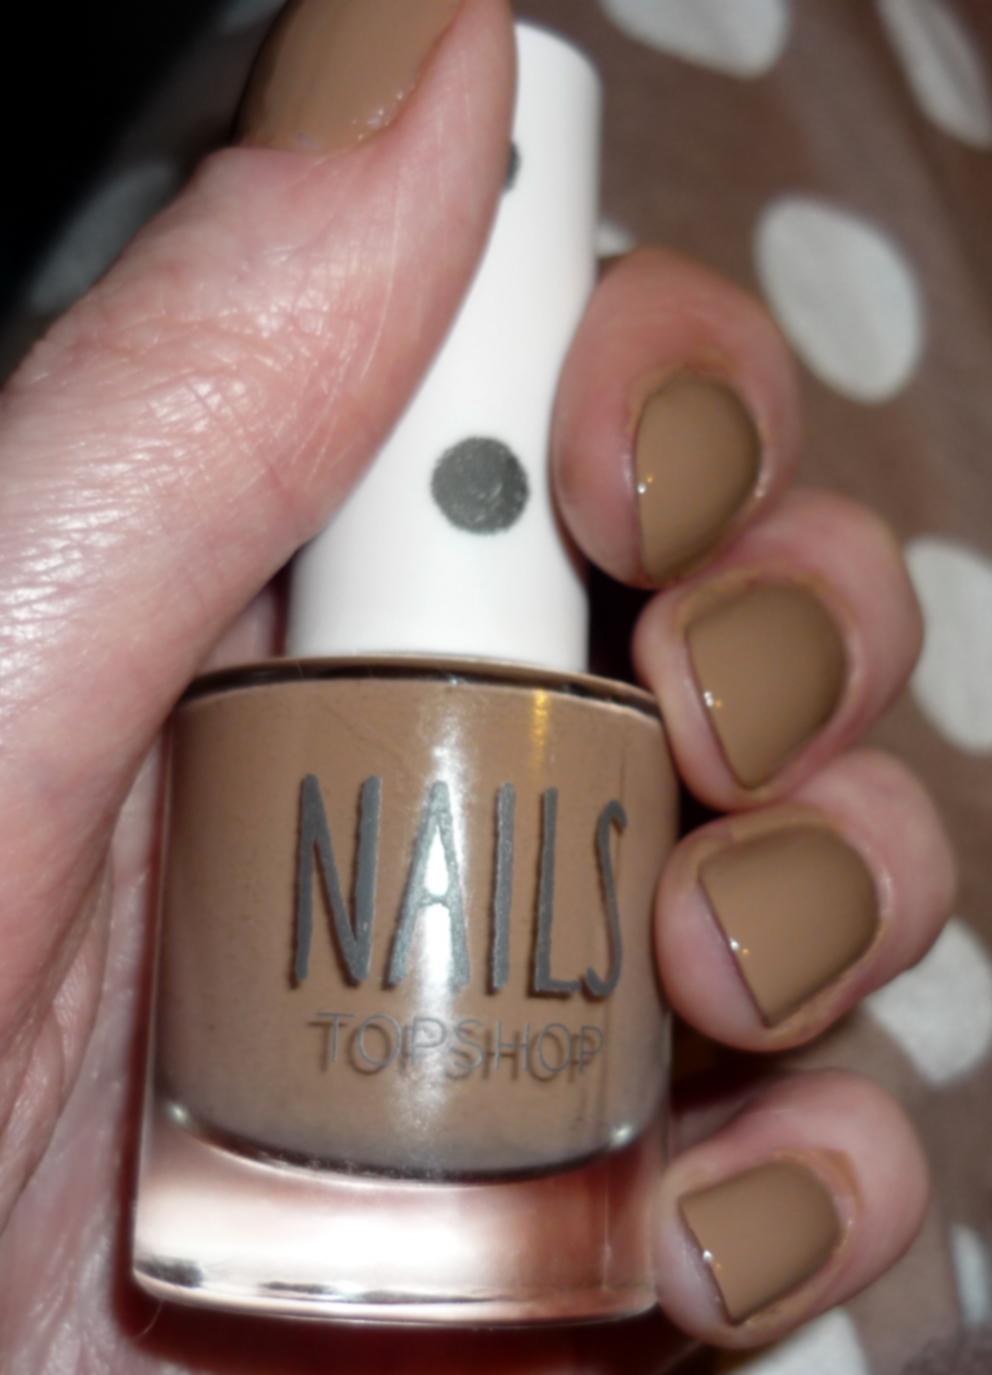 Lipstick Fever*: Topshop Nail Varnish - Geography Teacher